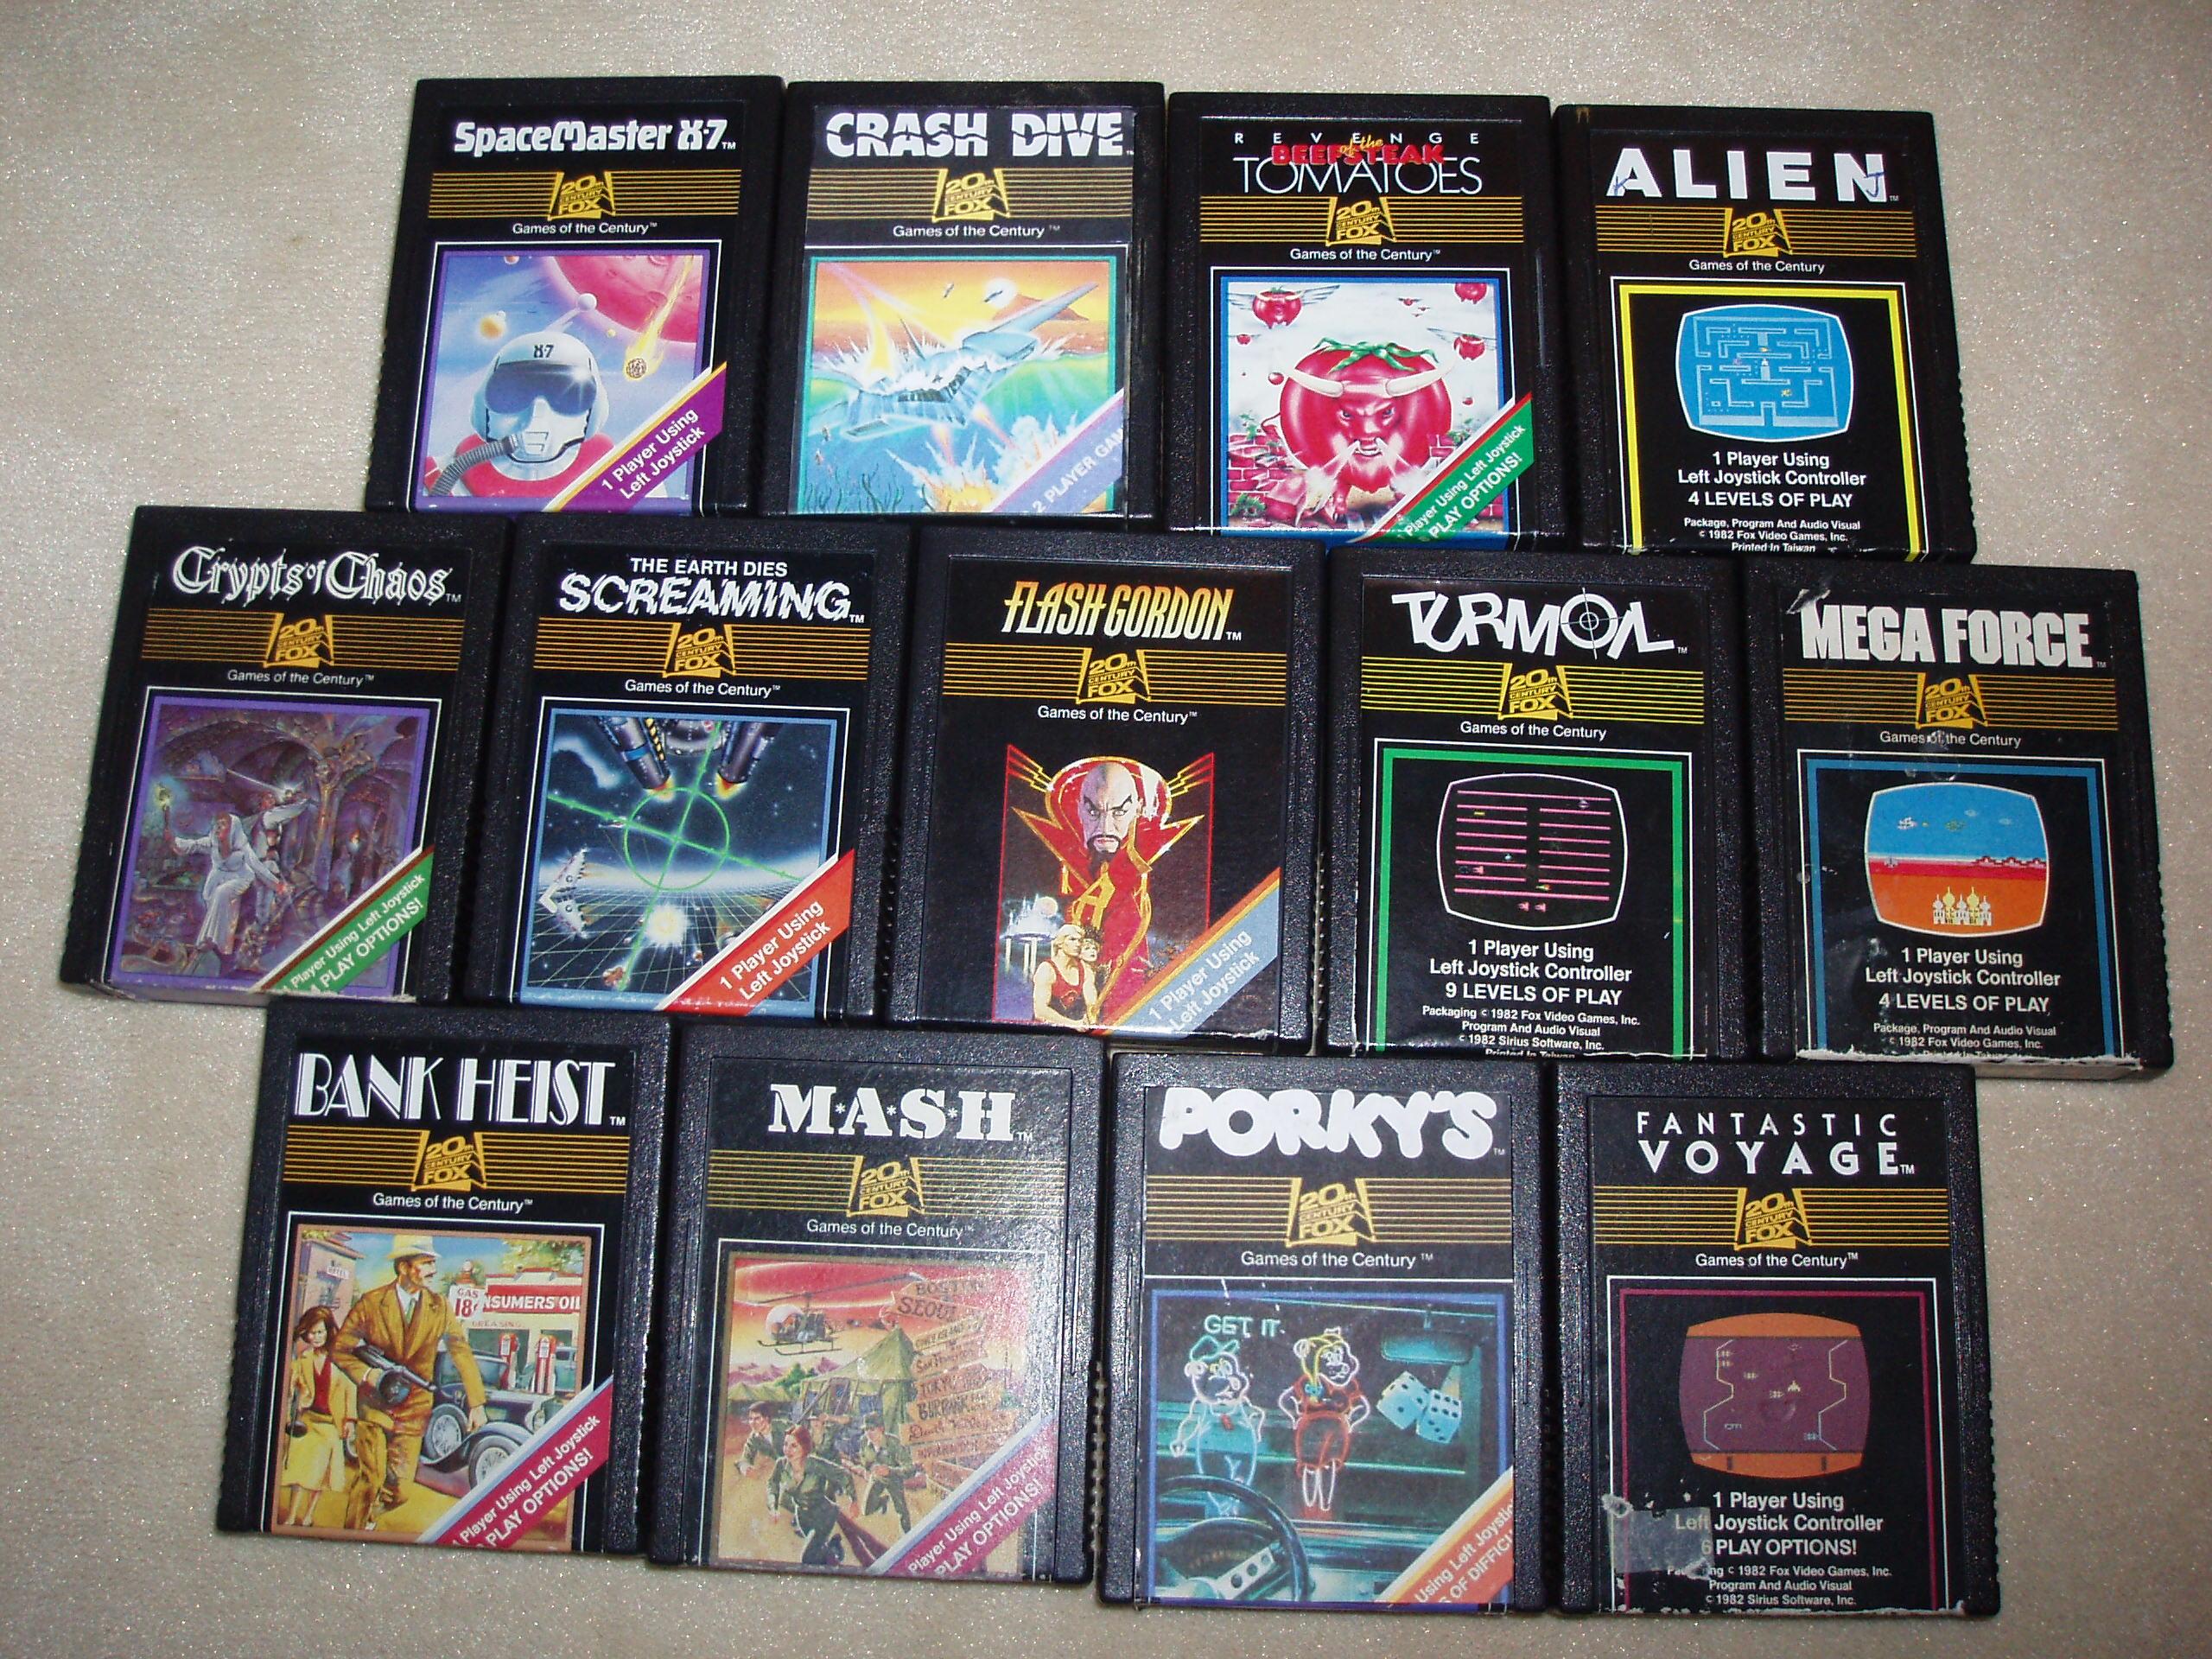 atari2600forever: Crypts of Chaos (Atari 2600 Novice/B) 613 points on 2018-12-18 03:25:15